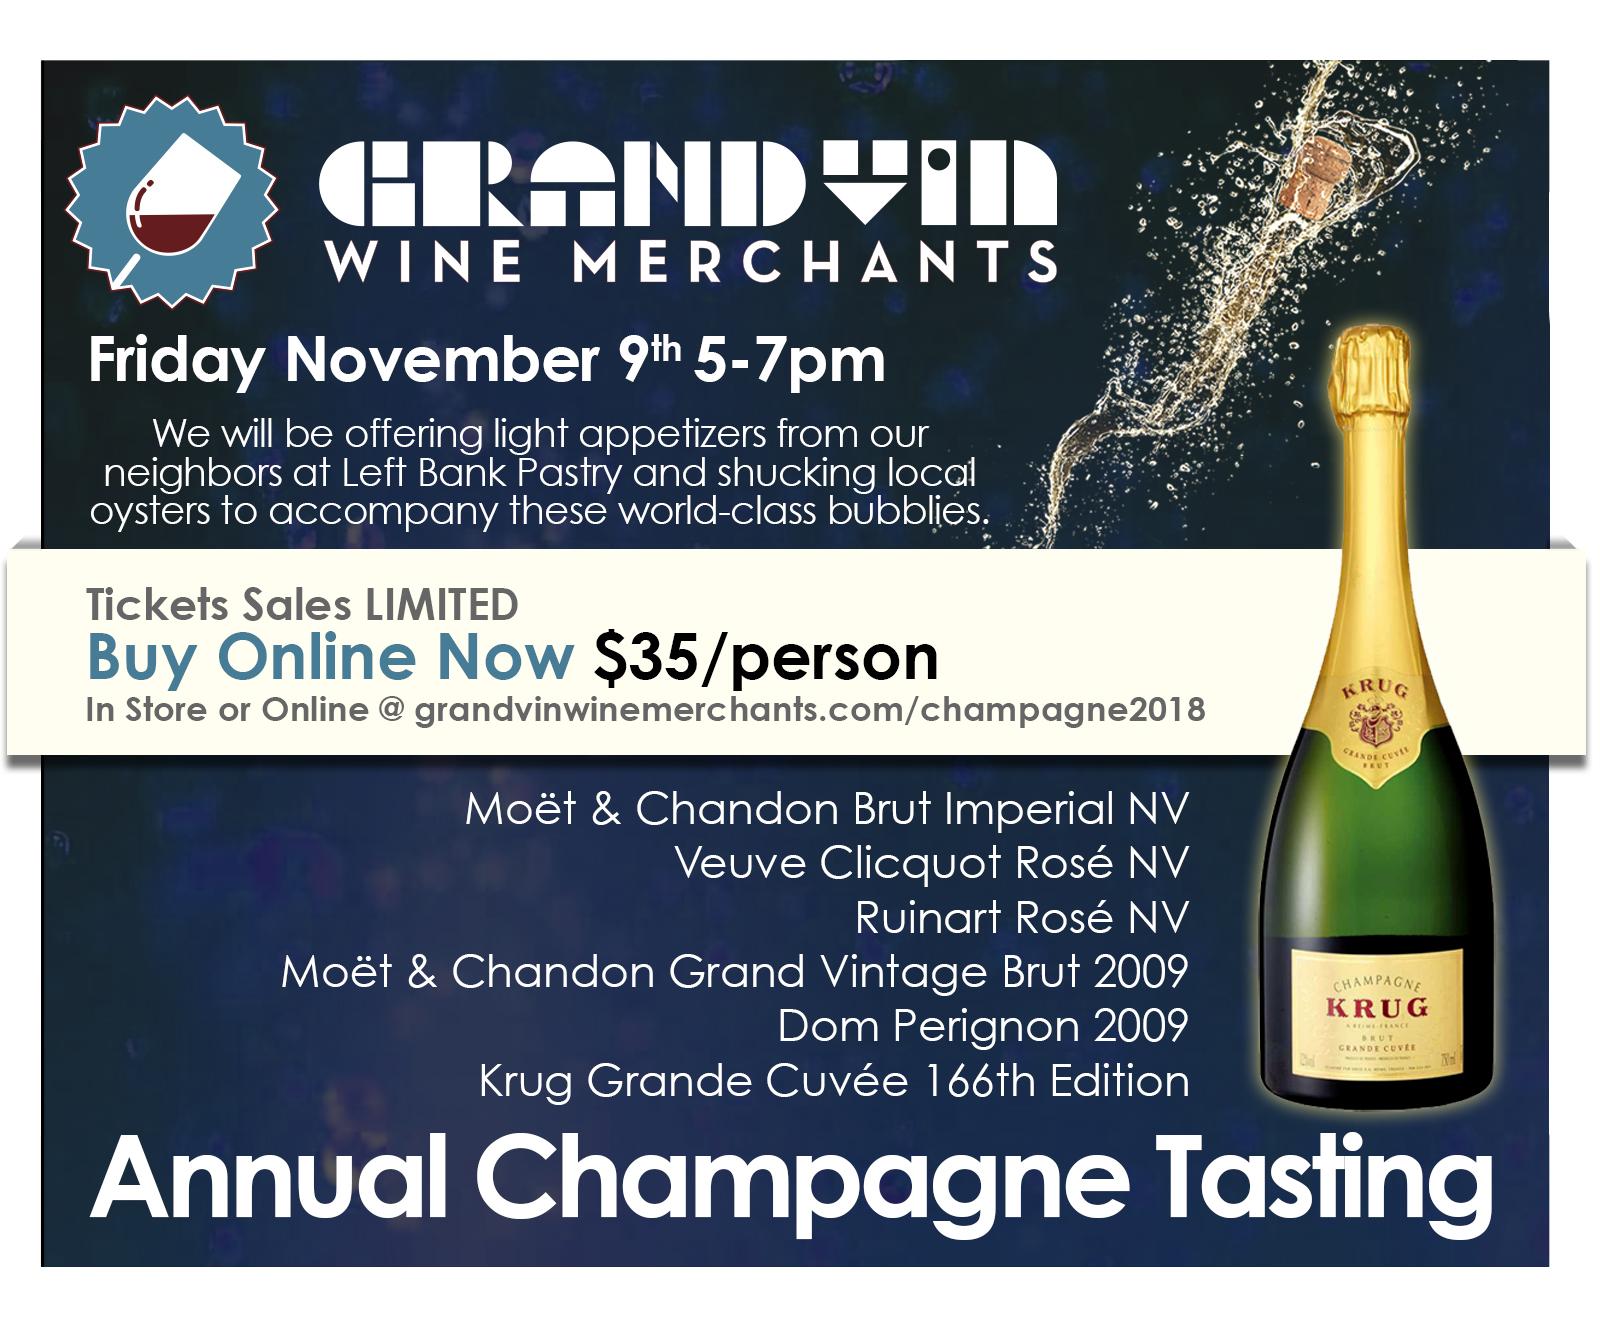 2018-champagne-flyer.jpg